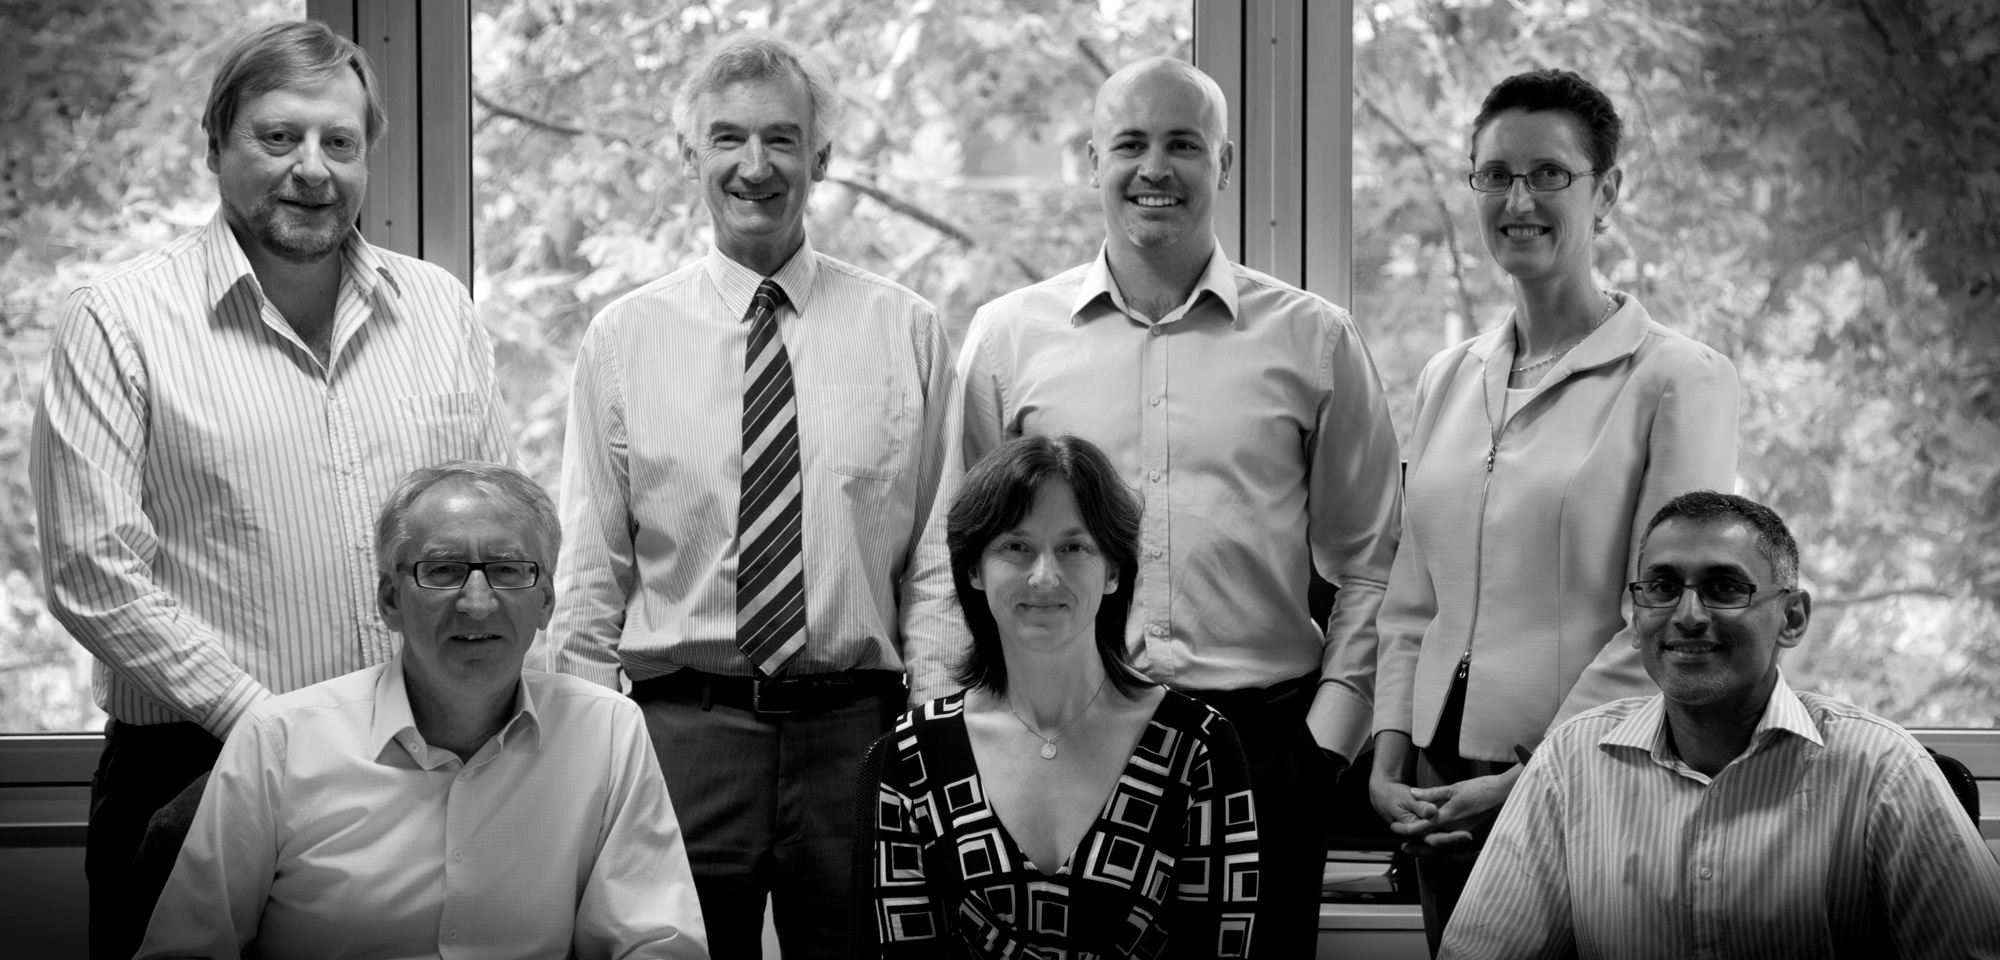 Net Balance Foundation Advisory Board   L-R back row: Rowan Dowland, Graham Hunter, Andrew Wilson, Wendy Stubbs  Front row: Geoff Mabbett, Jane Farago, Terence Jeyaretnam